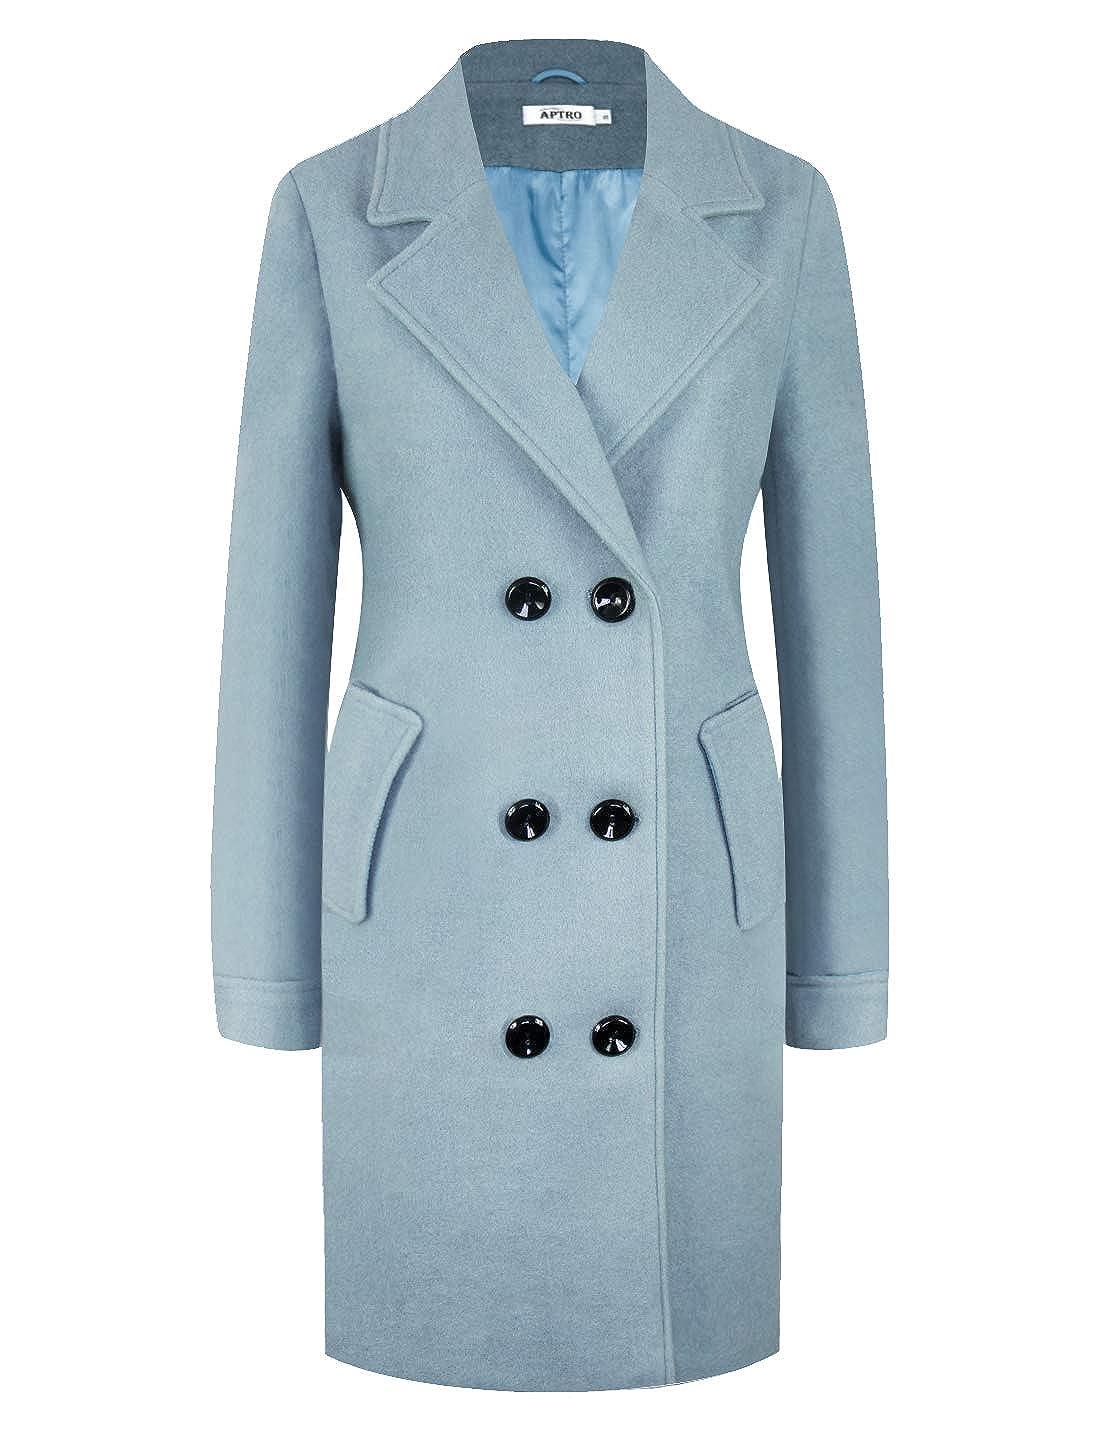 APTRO Women's Wool Coat Lapel Double-Breasted Long Classic Winter Windproof Jacket